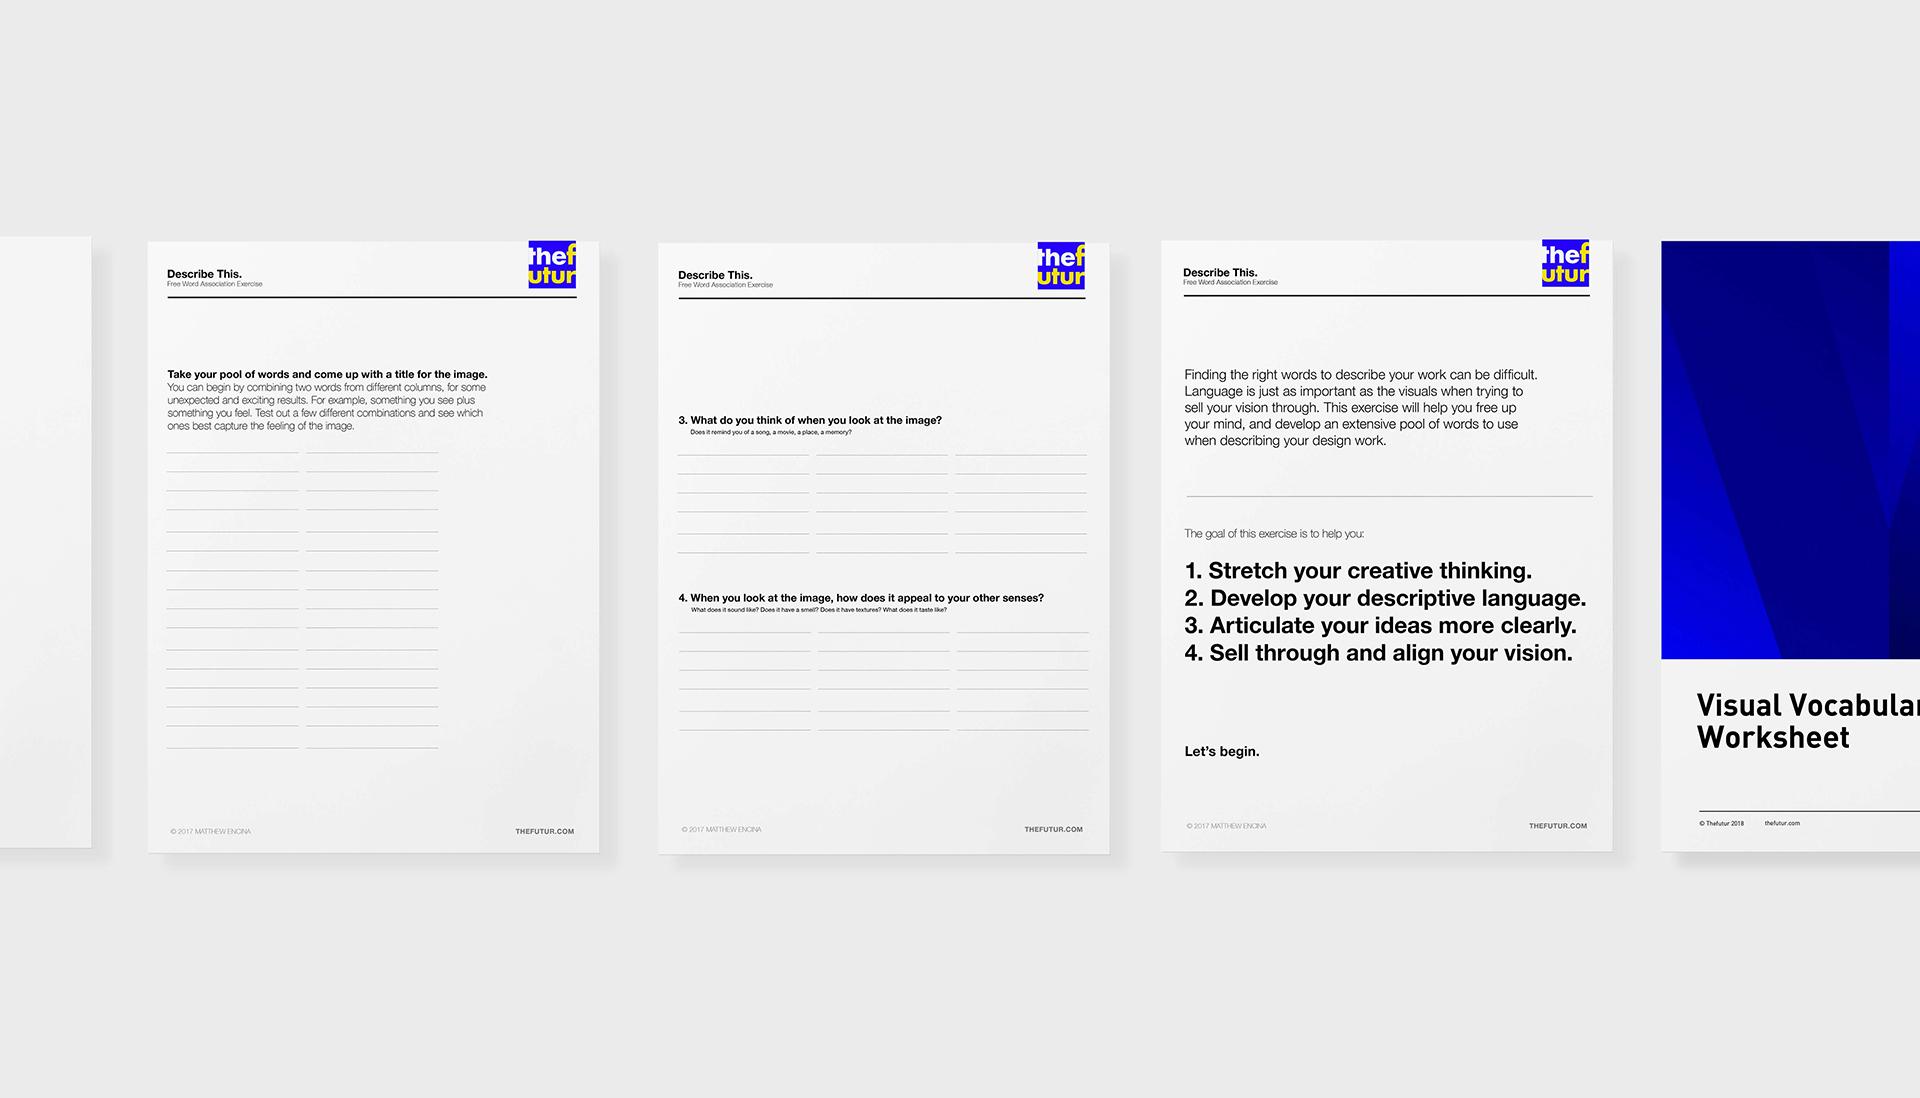 Visual Vocabulary Worksheet Free Download